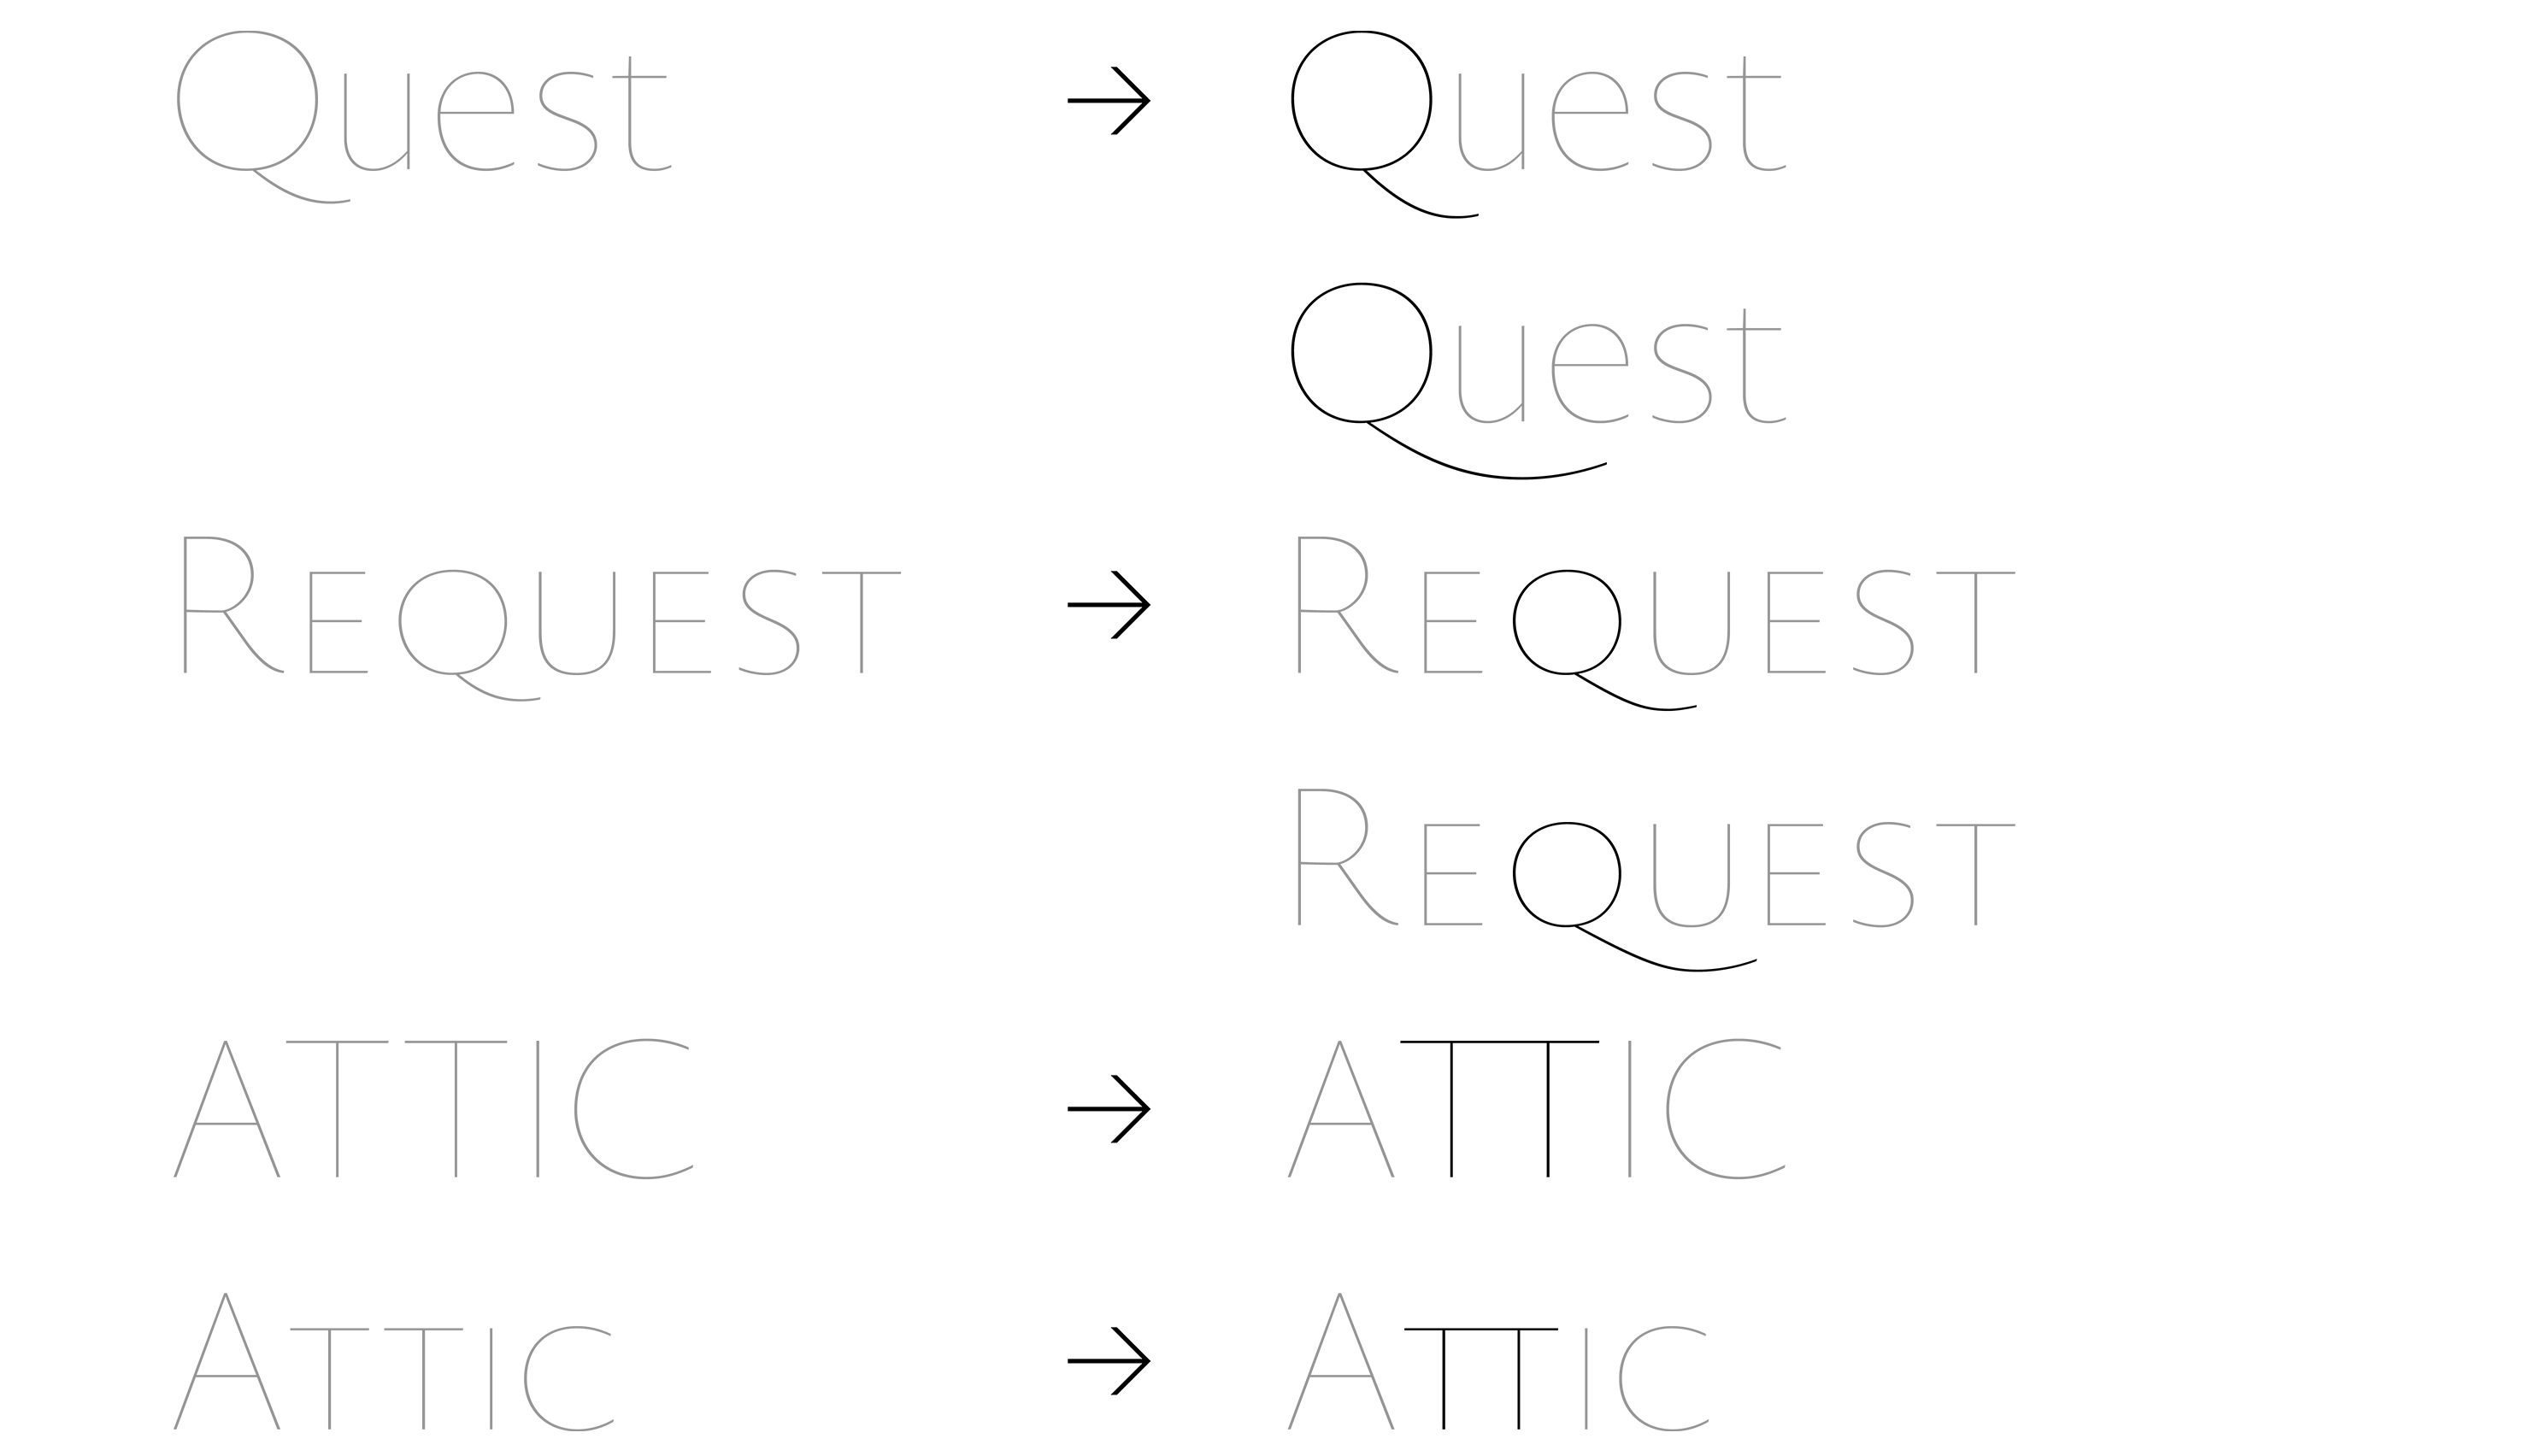 Typeface-Novel-Sans-Hairline-F06-Atlas-Font-Foundry